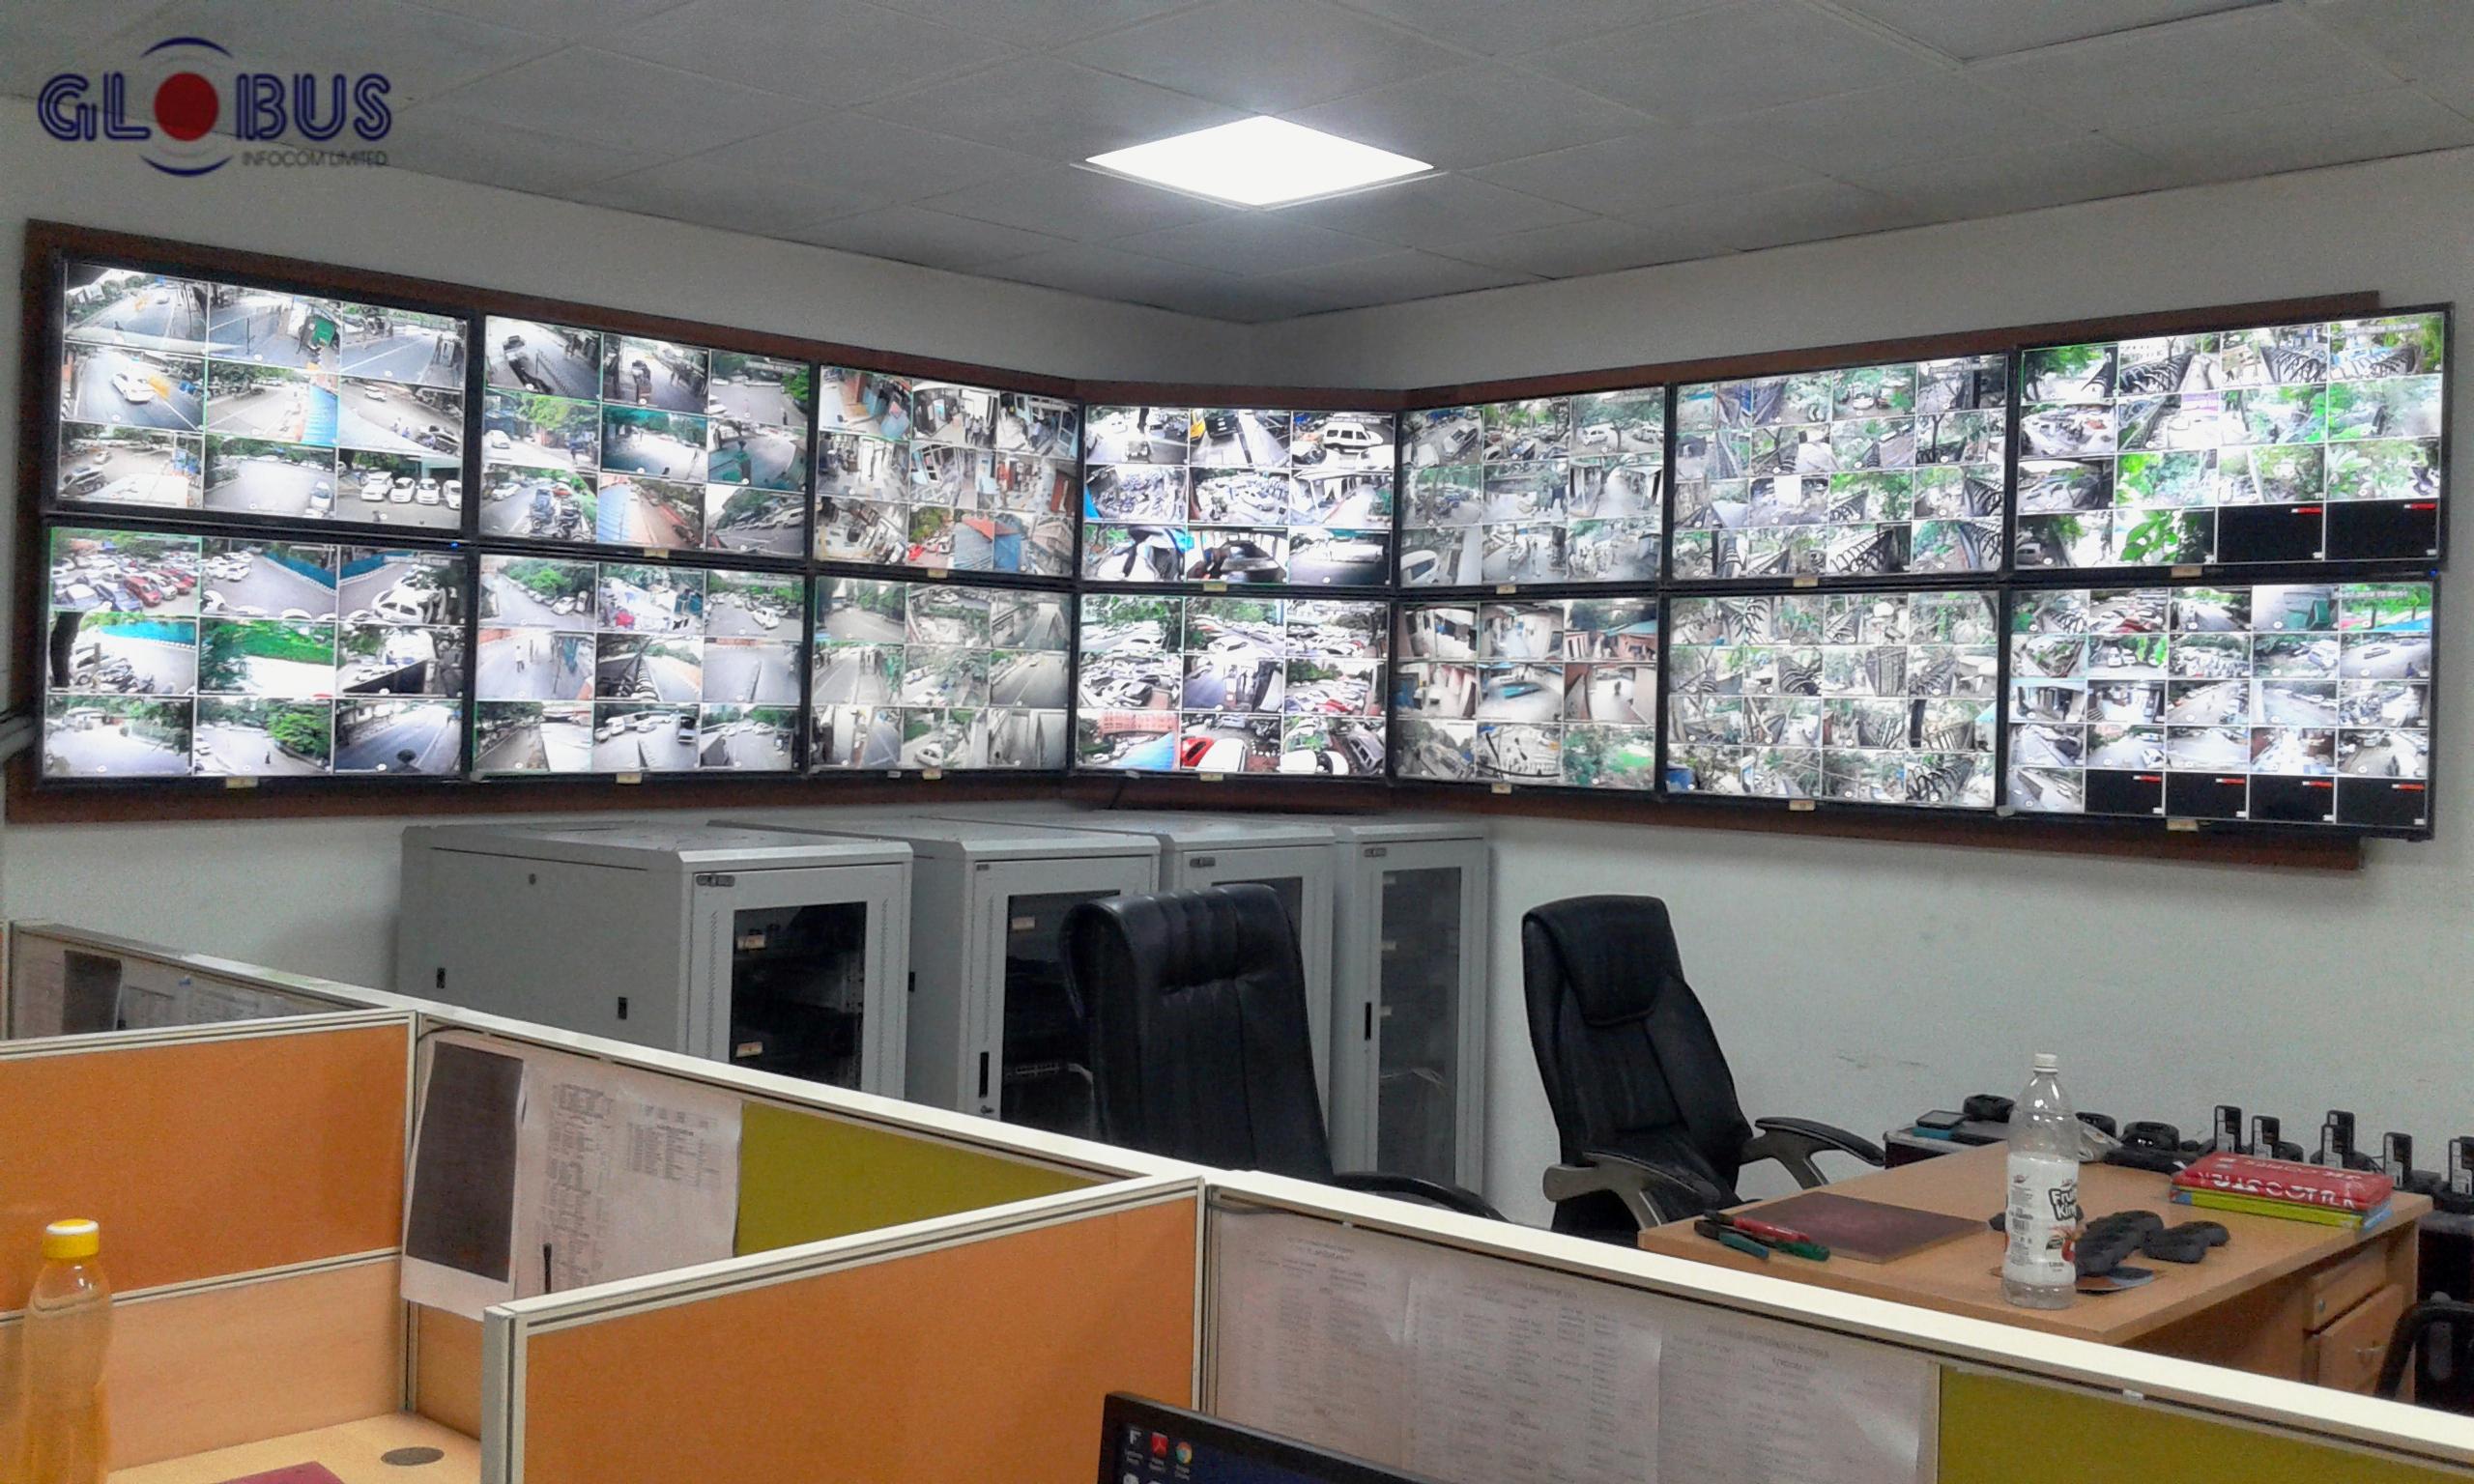 Globus CCTV cameras